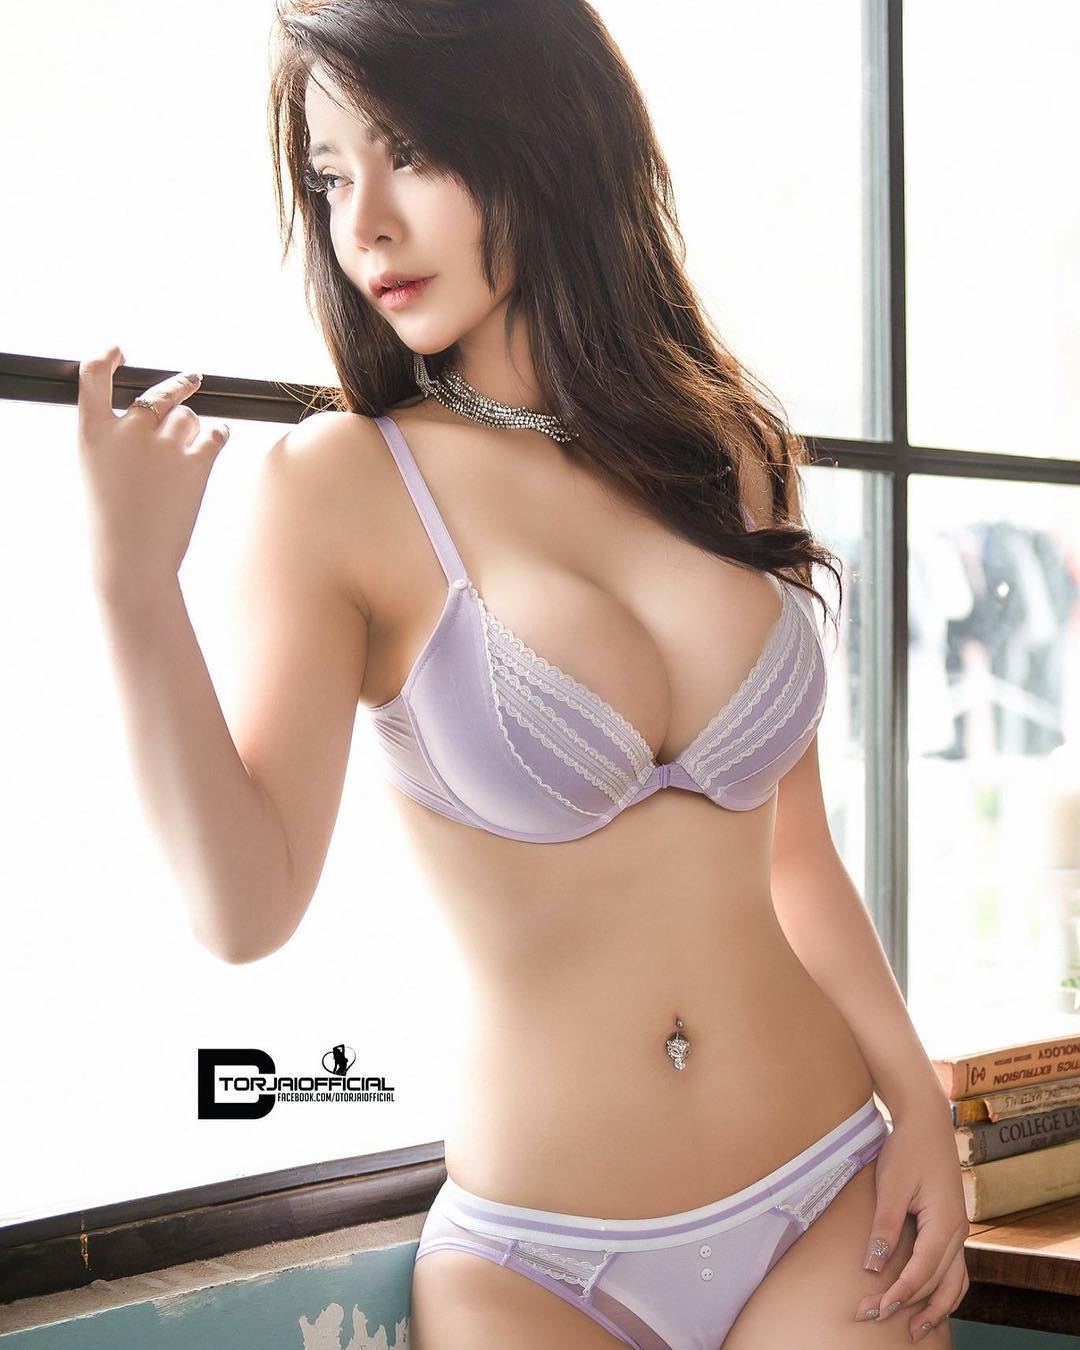 Thailand Mature Sister Big Boobs Private Photos